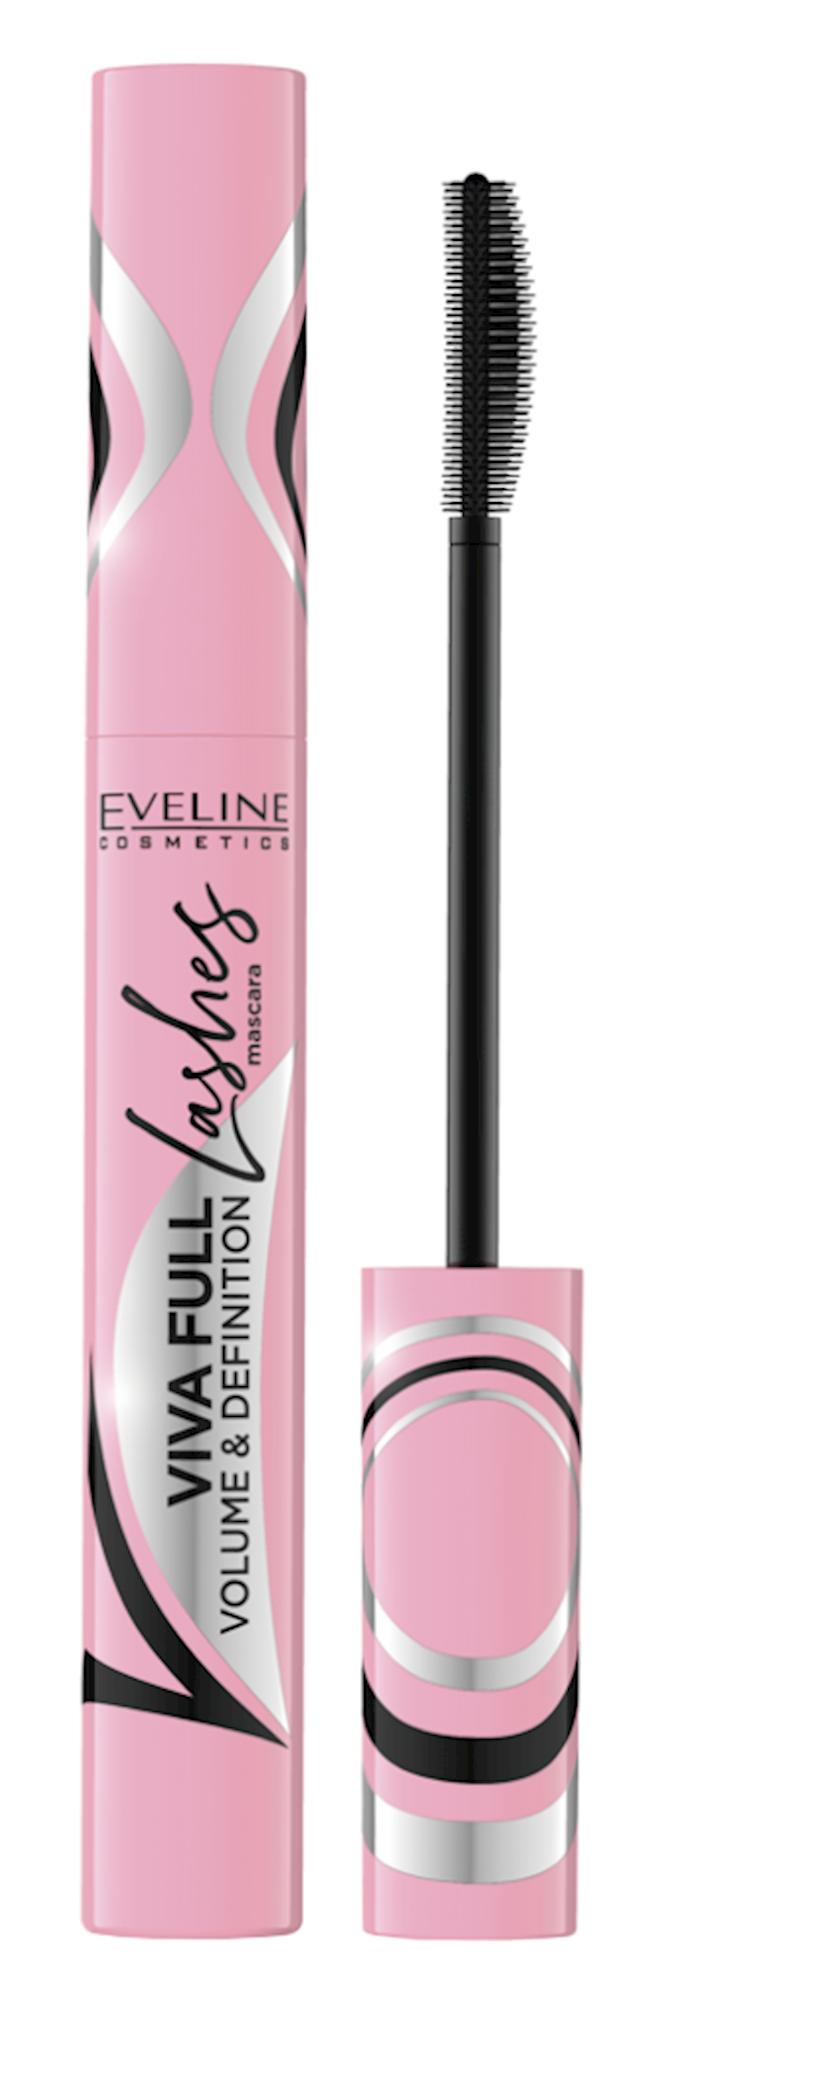 Kipriklər üçün tuş Eveline Viva Full Lashes Mascara Black Volume & Definition 10 ml